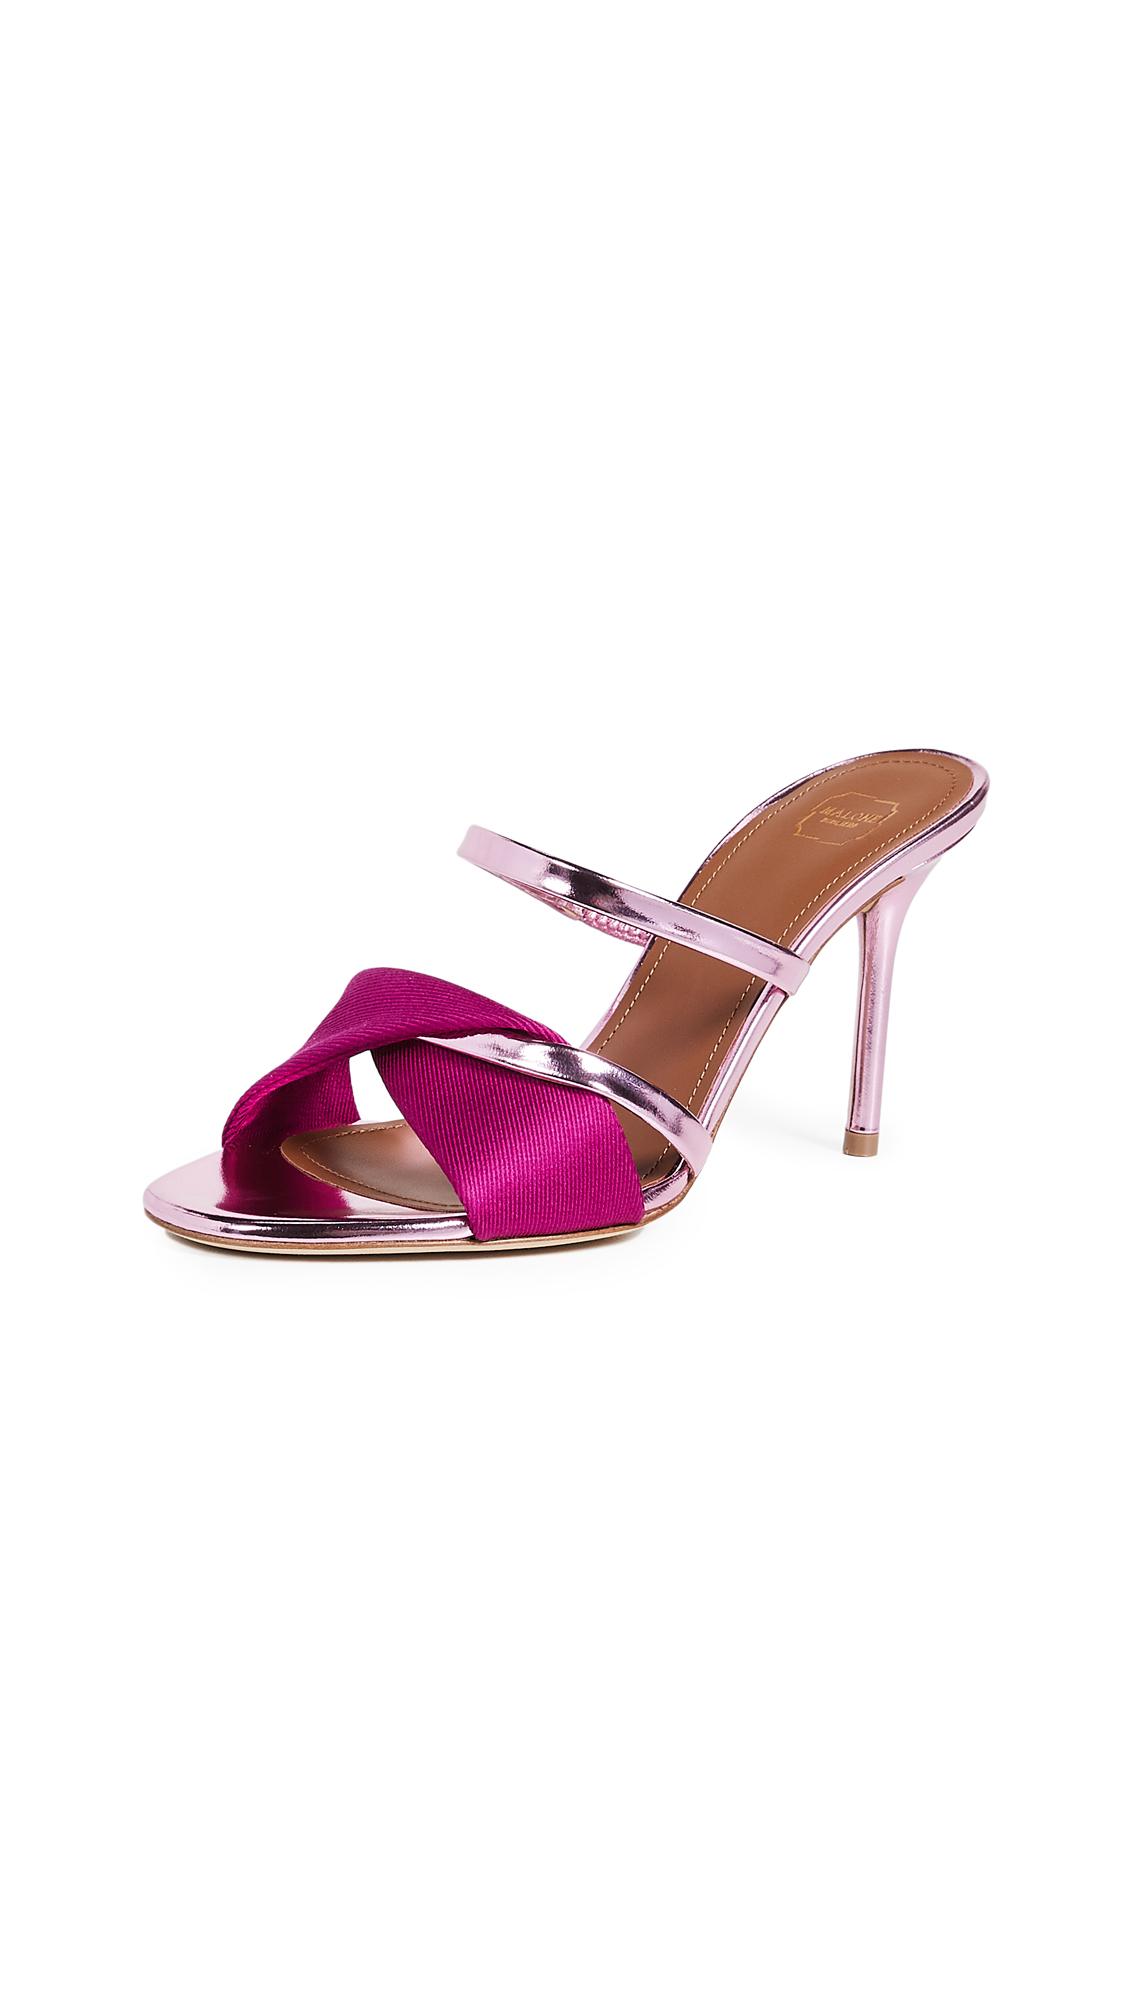 Malone Souliers Tasha 85 Sandals - Fuchsia/Pink